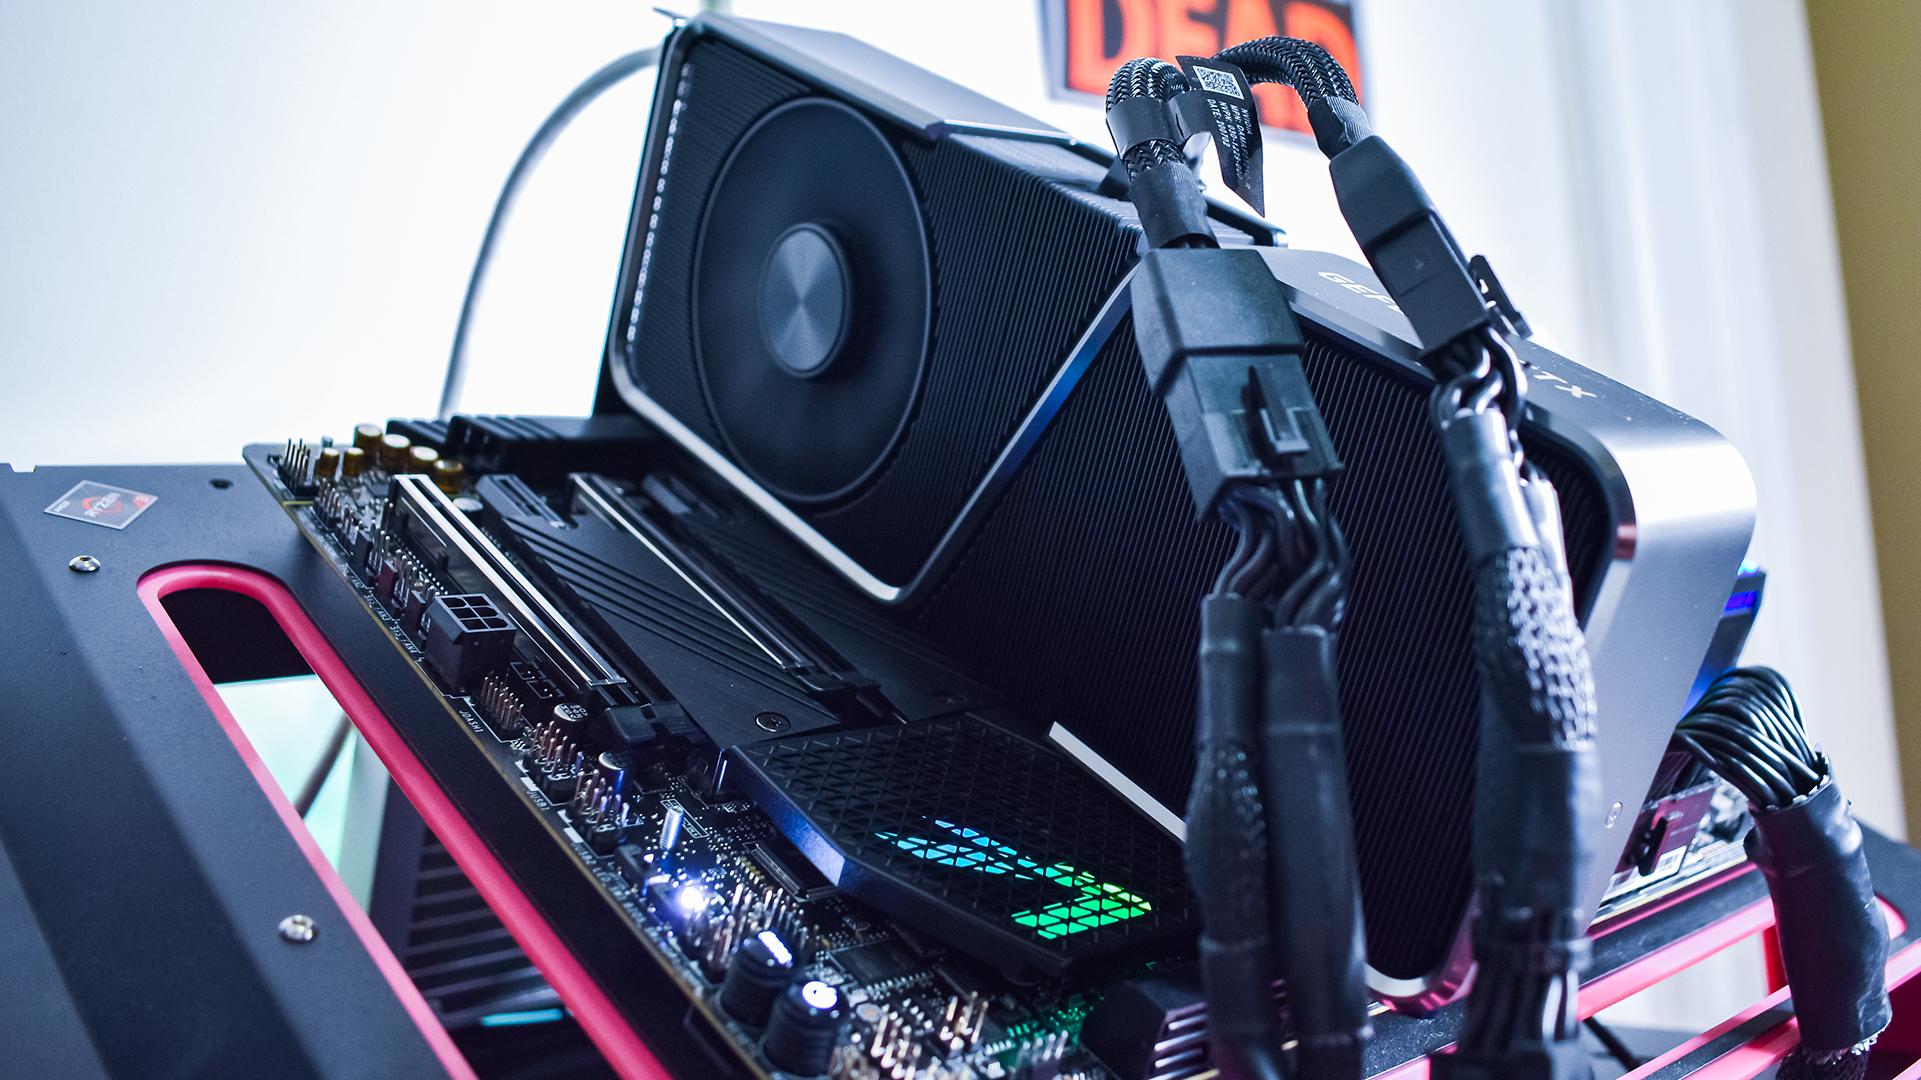 Nvidia GeForce RTX 3070 Ti